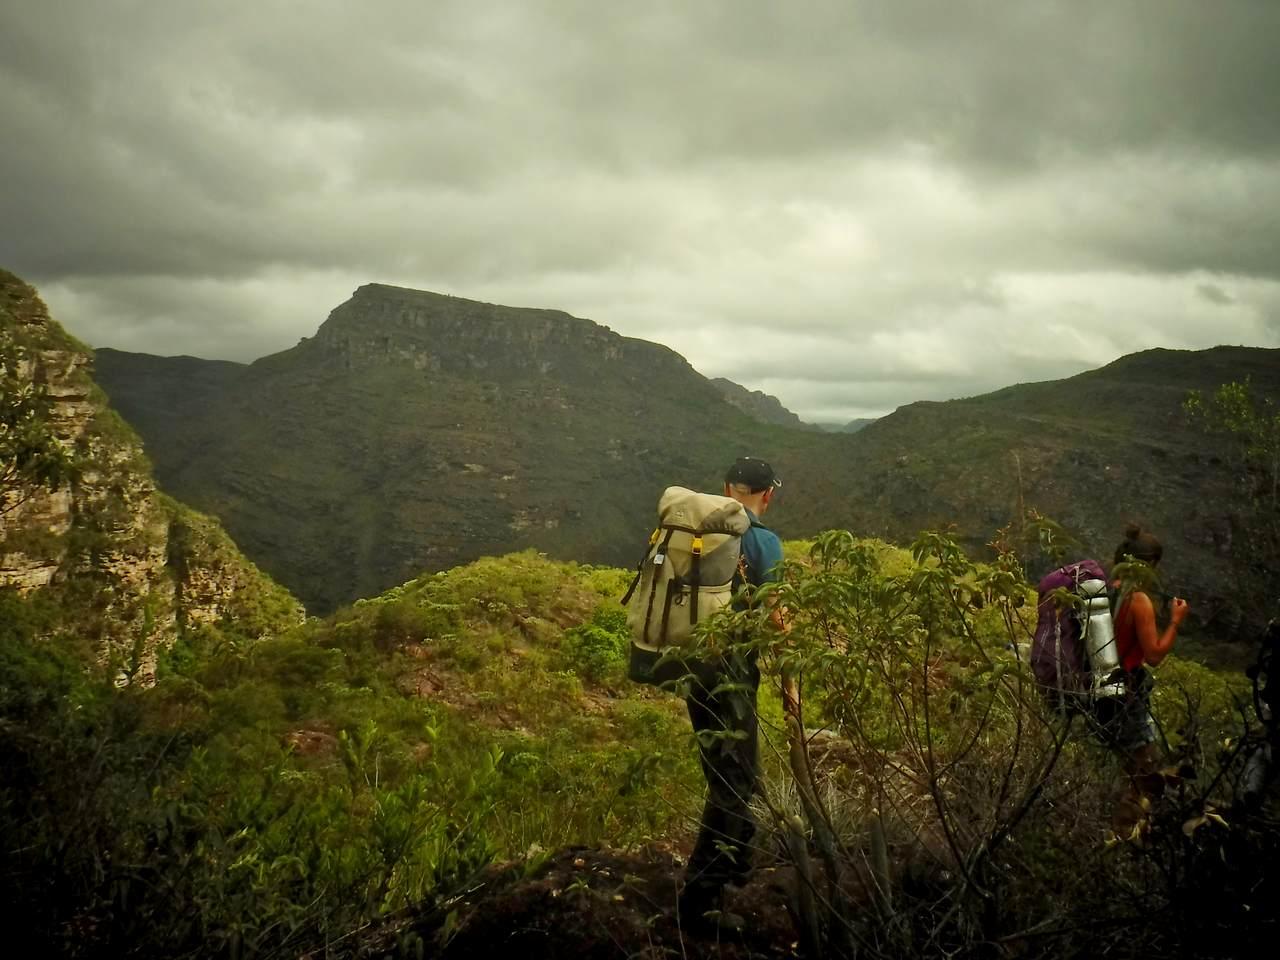 Views of the Capivara Canyon, Chapada Diamantina, Brazil (2)